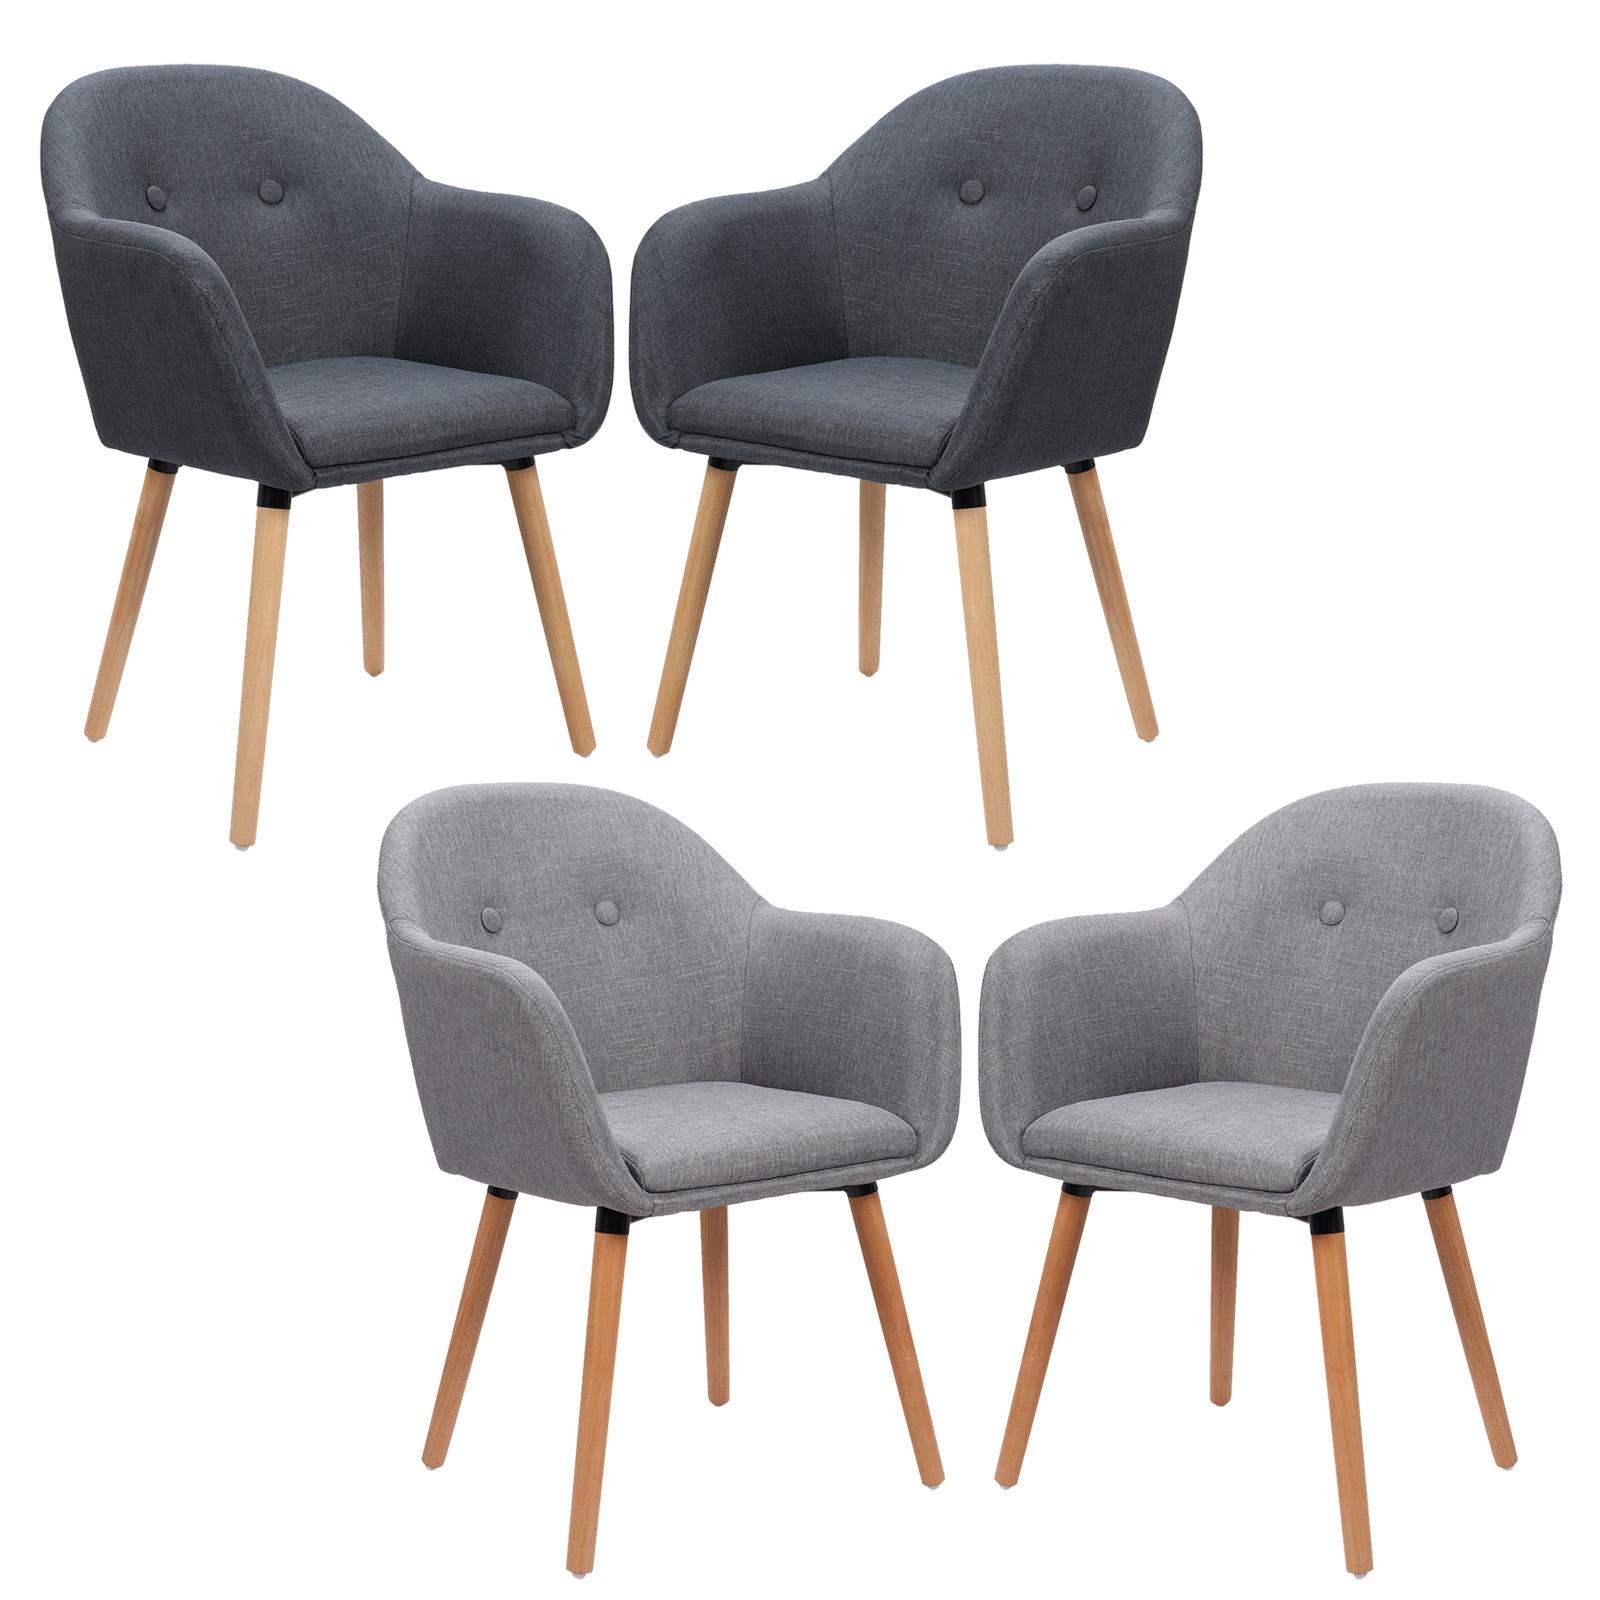 esszimmerst hle k chenstuhl wohnzimmerstuhl stuhl mit. Black Bedroom Furniture Sets. Home Design Ideas